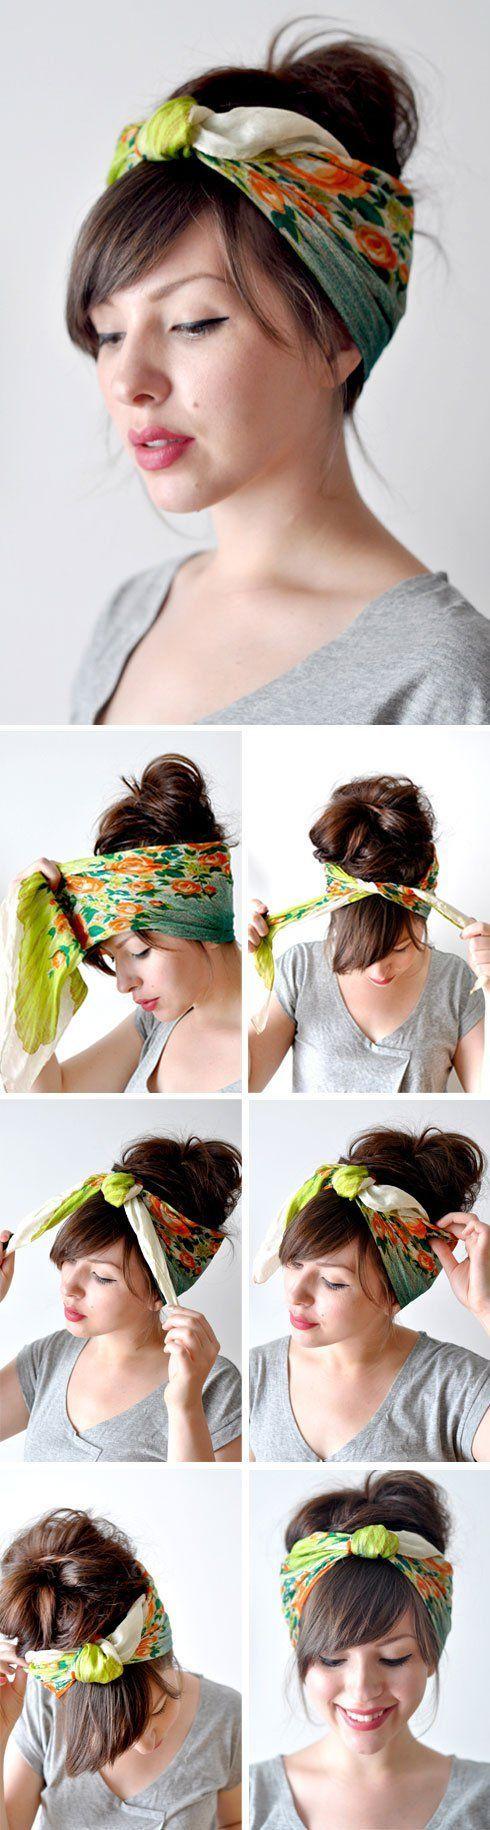 30 modi per indossare fasce e turbanti per l estate d0dafe64bb6f